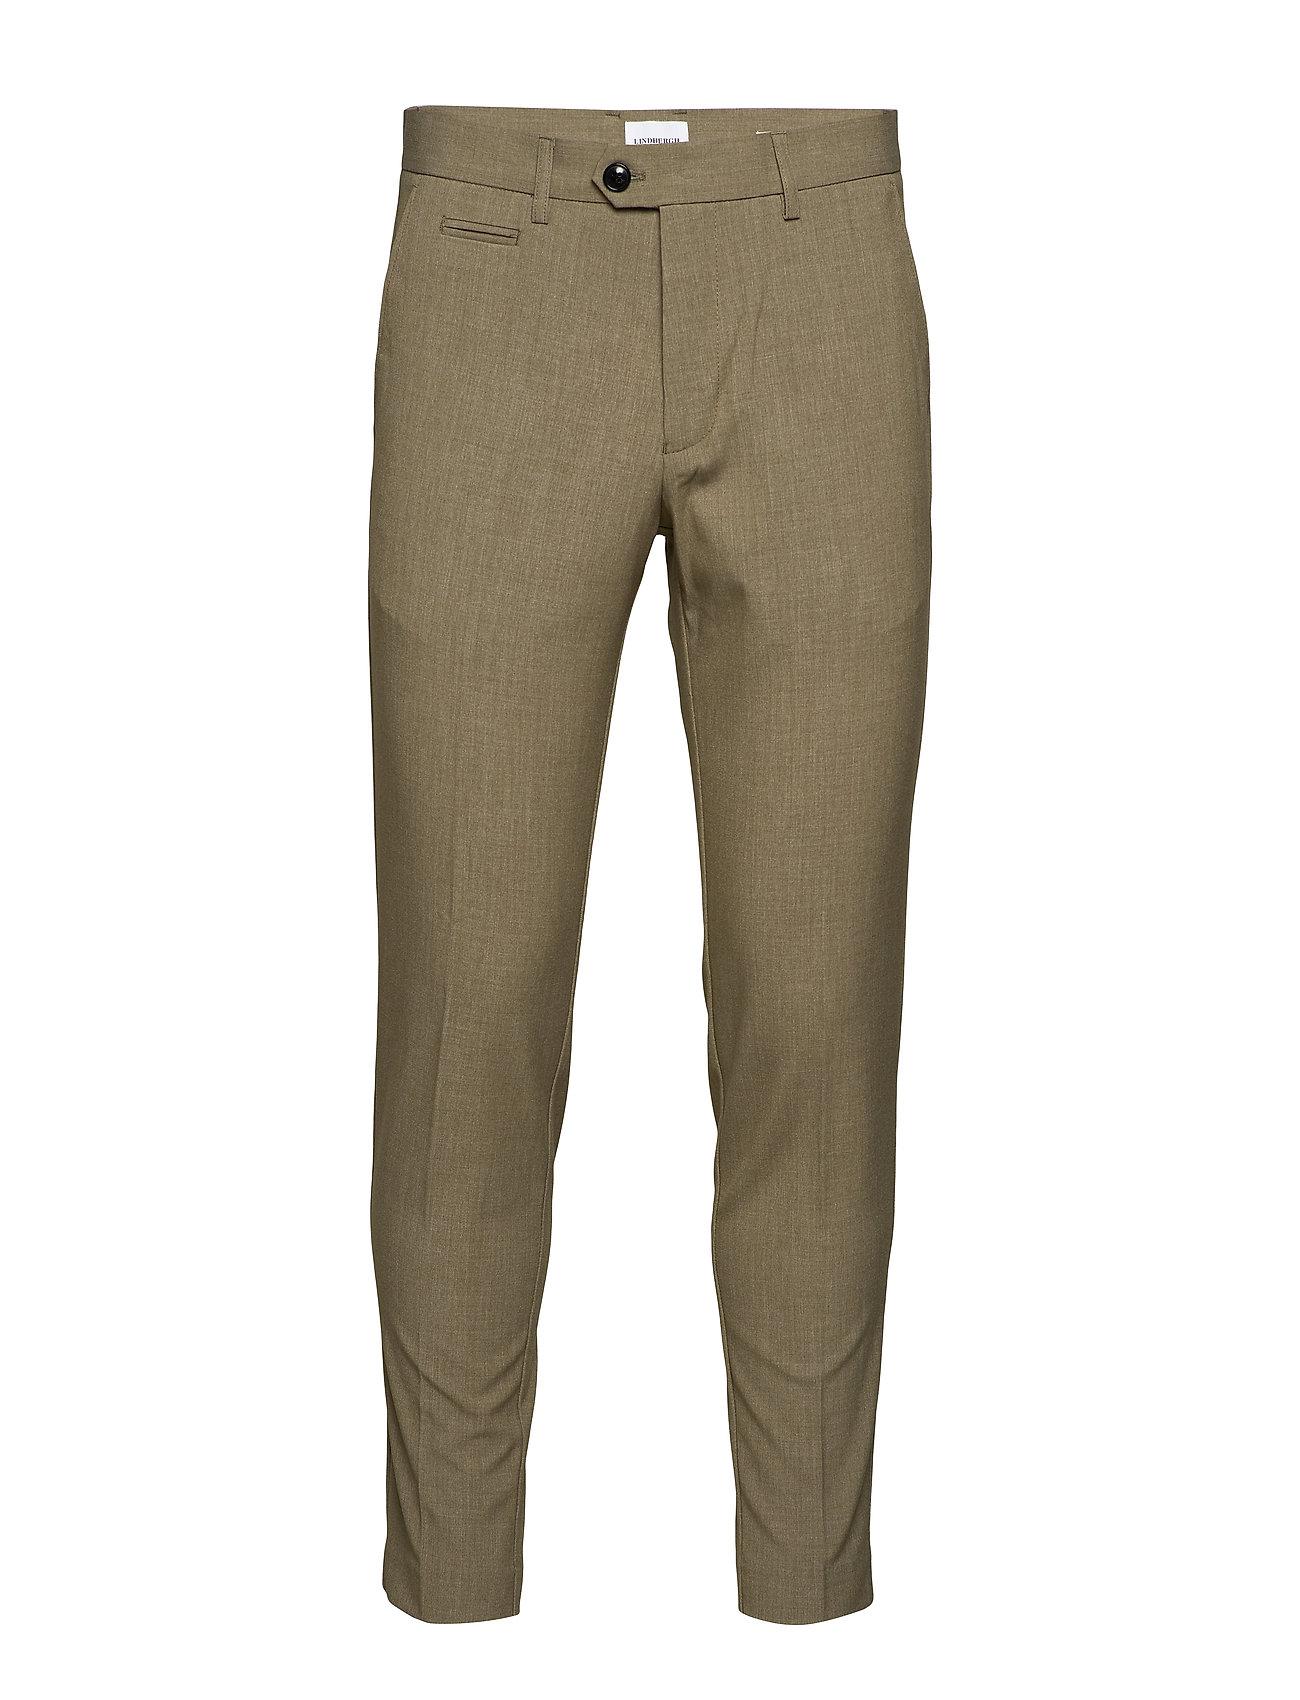 Lindbergh Club pants - LT ARMY MIX